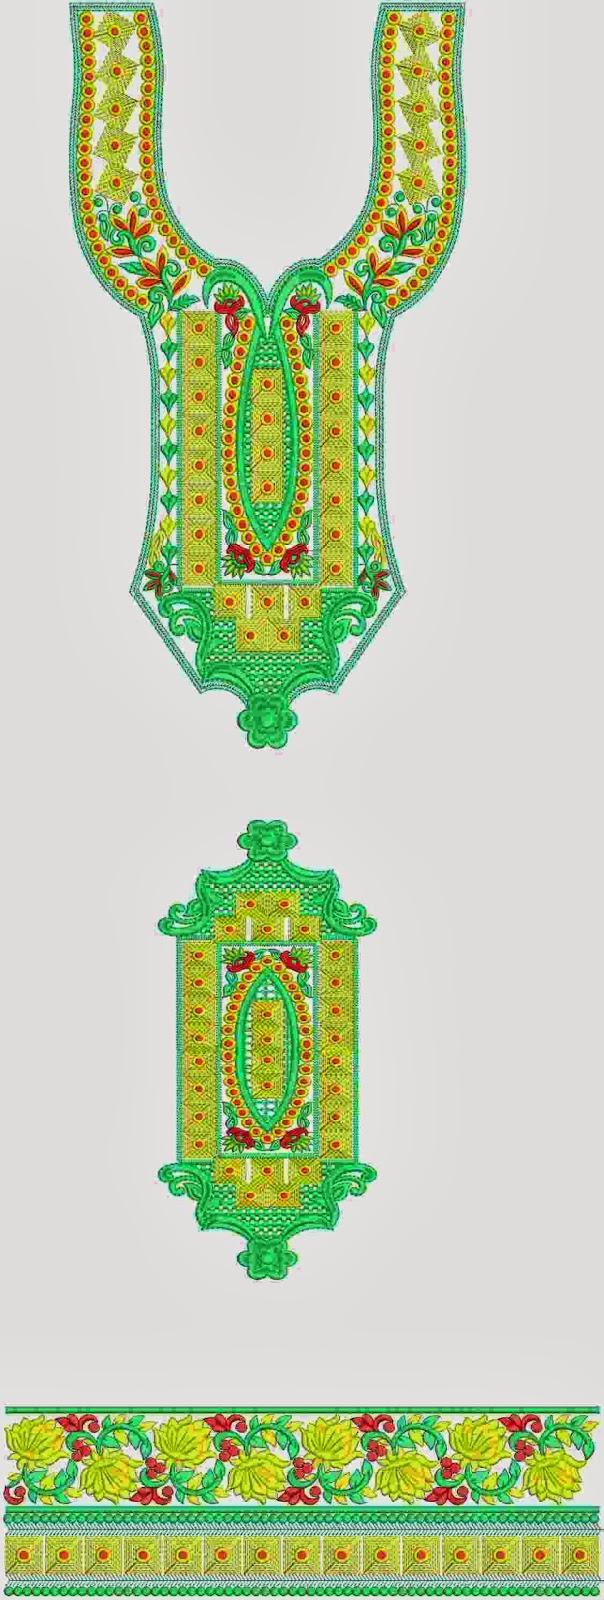 ... patch work designs also see fantastic kurti in u shaped neck design